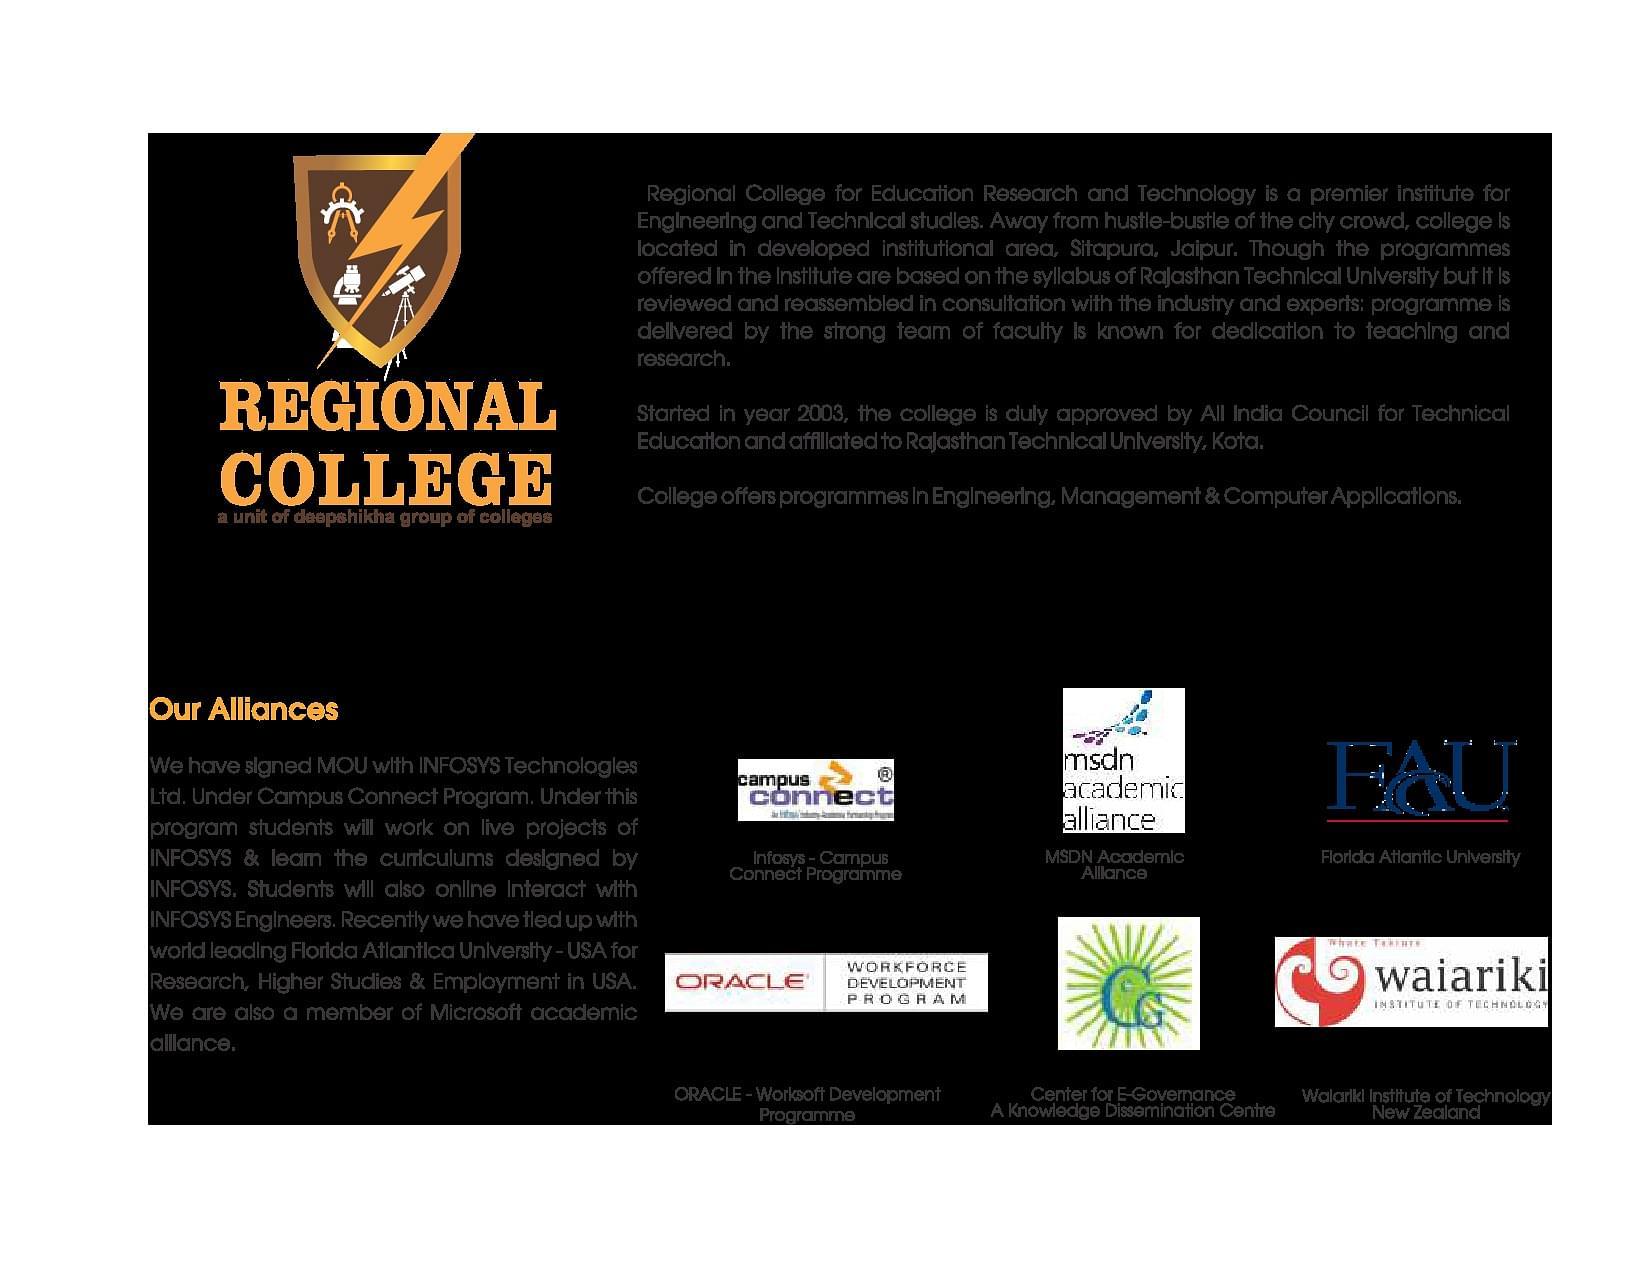 Regional College Jaipur Admissions Contact Website